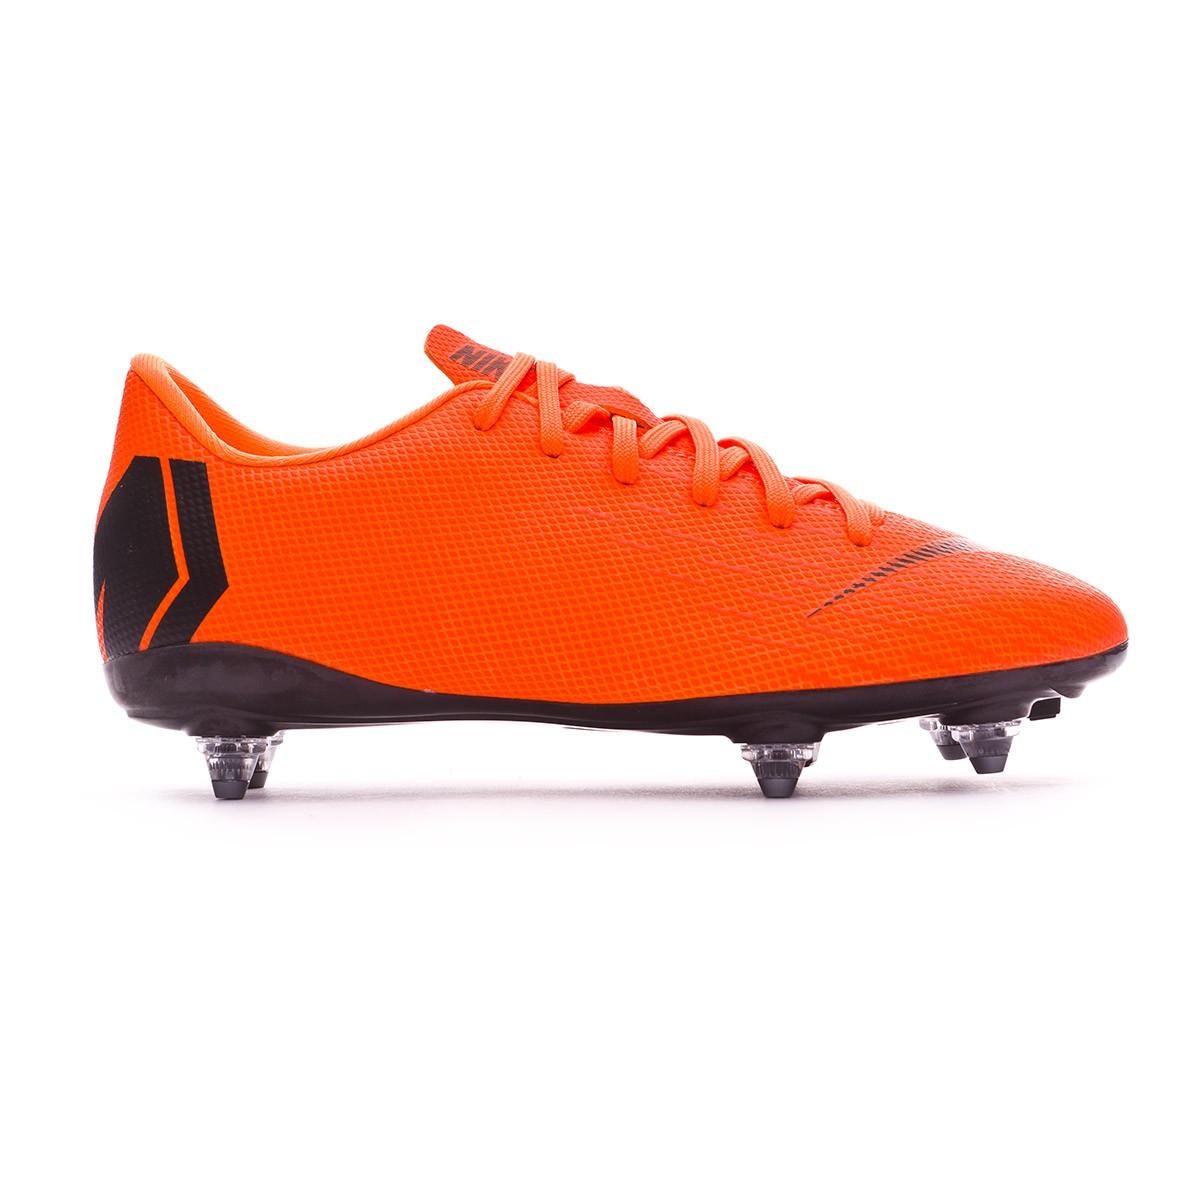 3998cfb33 Football Boots Nike Kids Mercurial Vapor XII Academy GS SG-Pro Total  orange-Black-Volt - Football store Fútbol Emotion